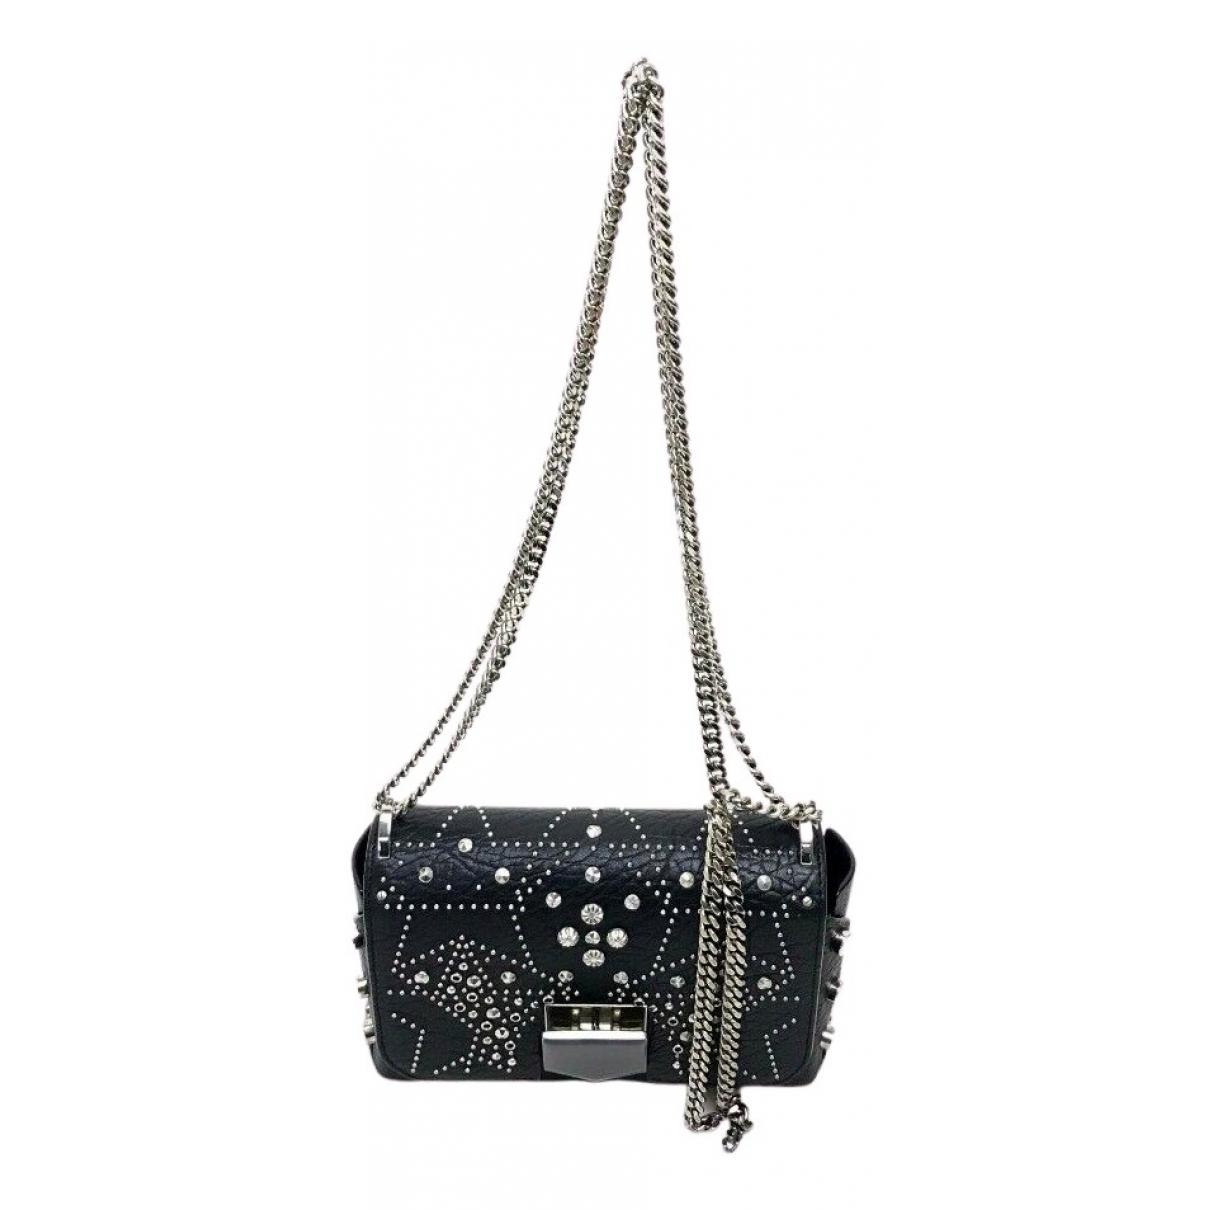 Jimmy Choo N Leather handbag for Women N